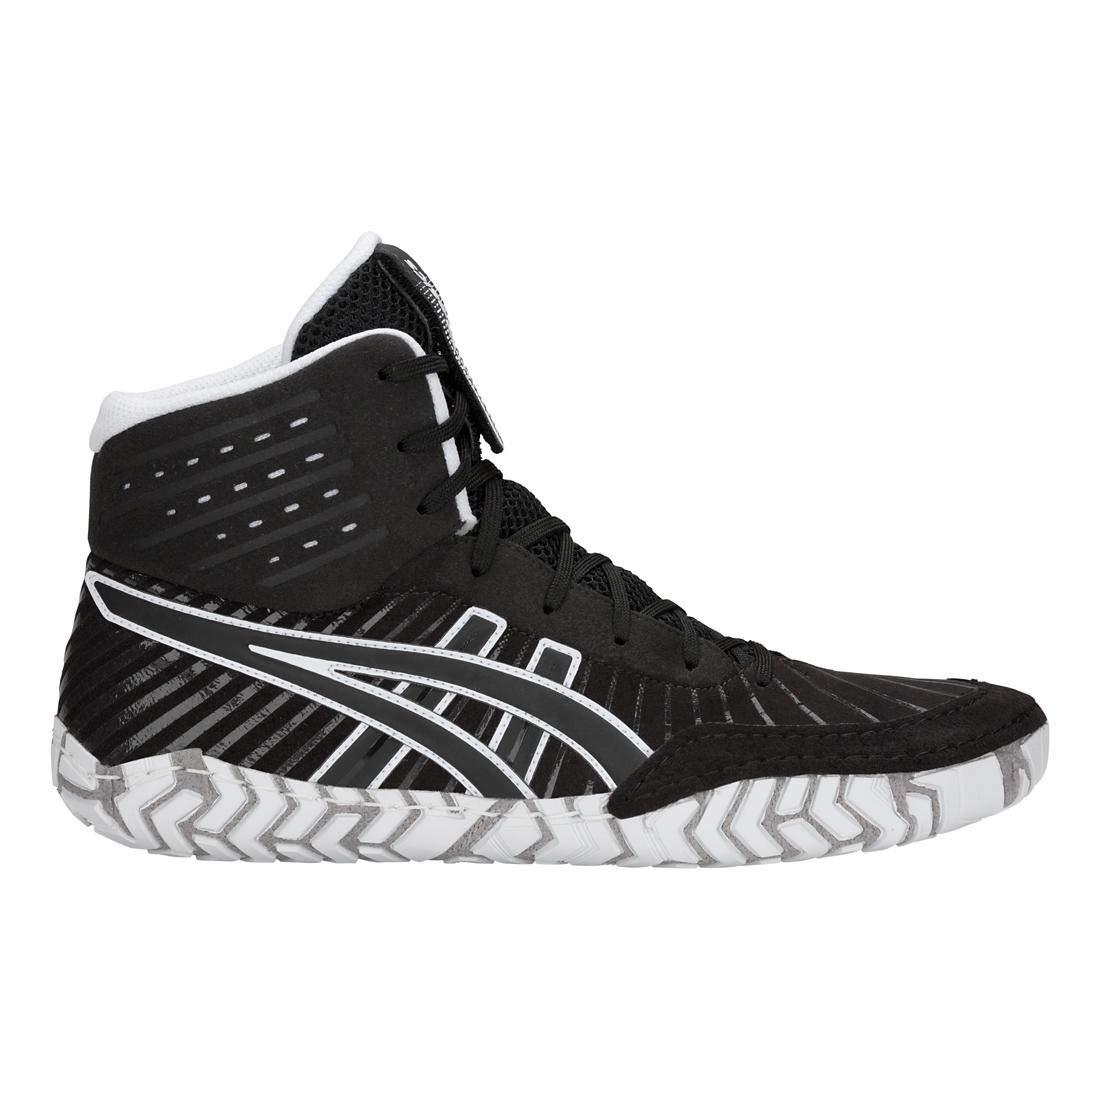 Black//Black ASICS Aggressor 4 Mens Wrestling Shoes 8.5